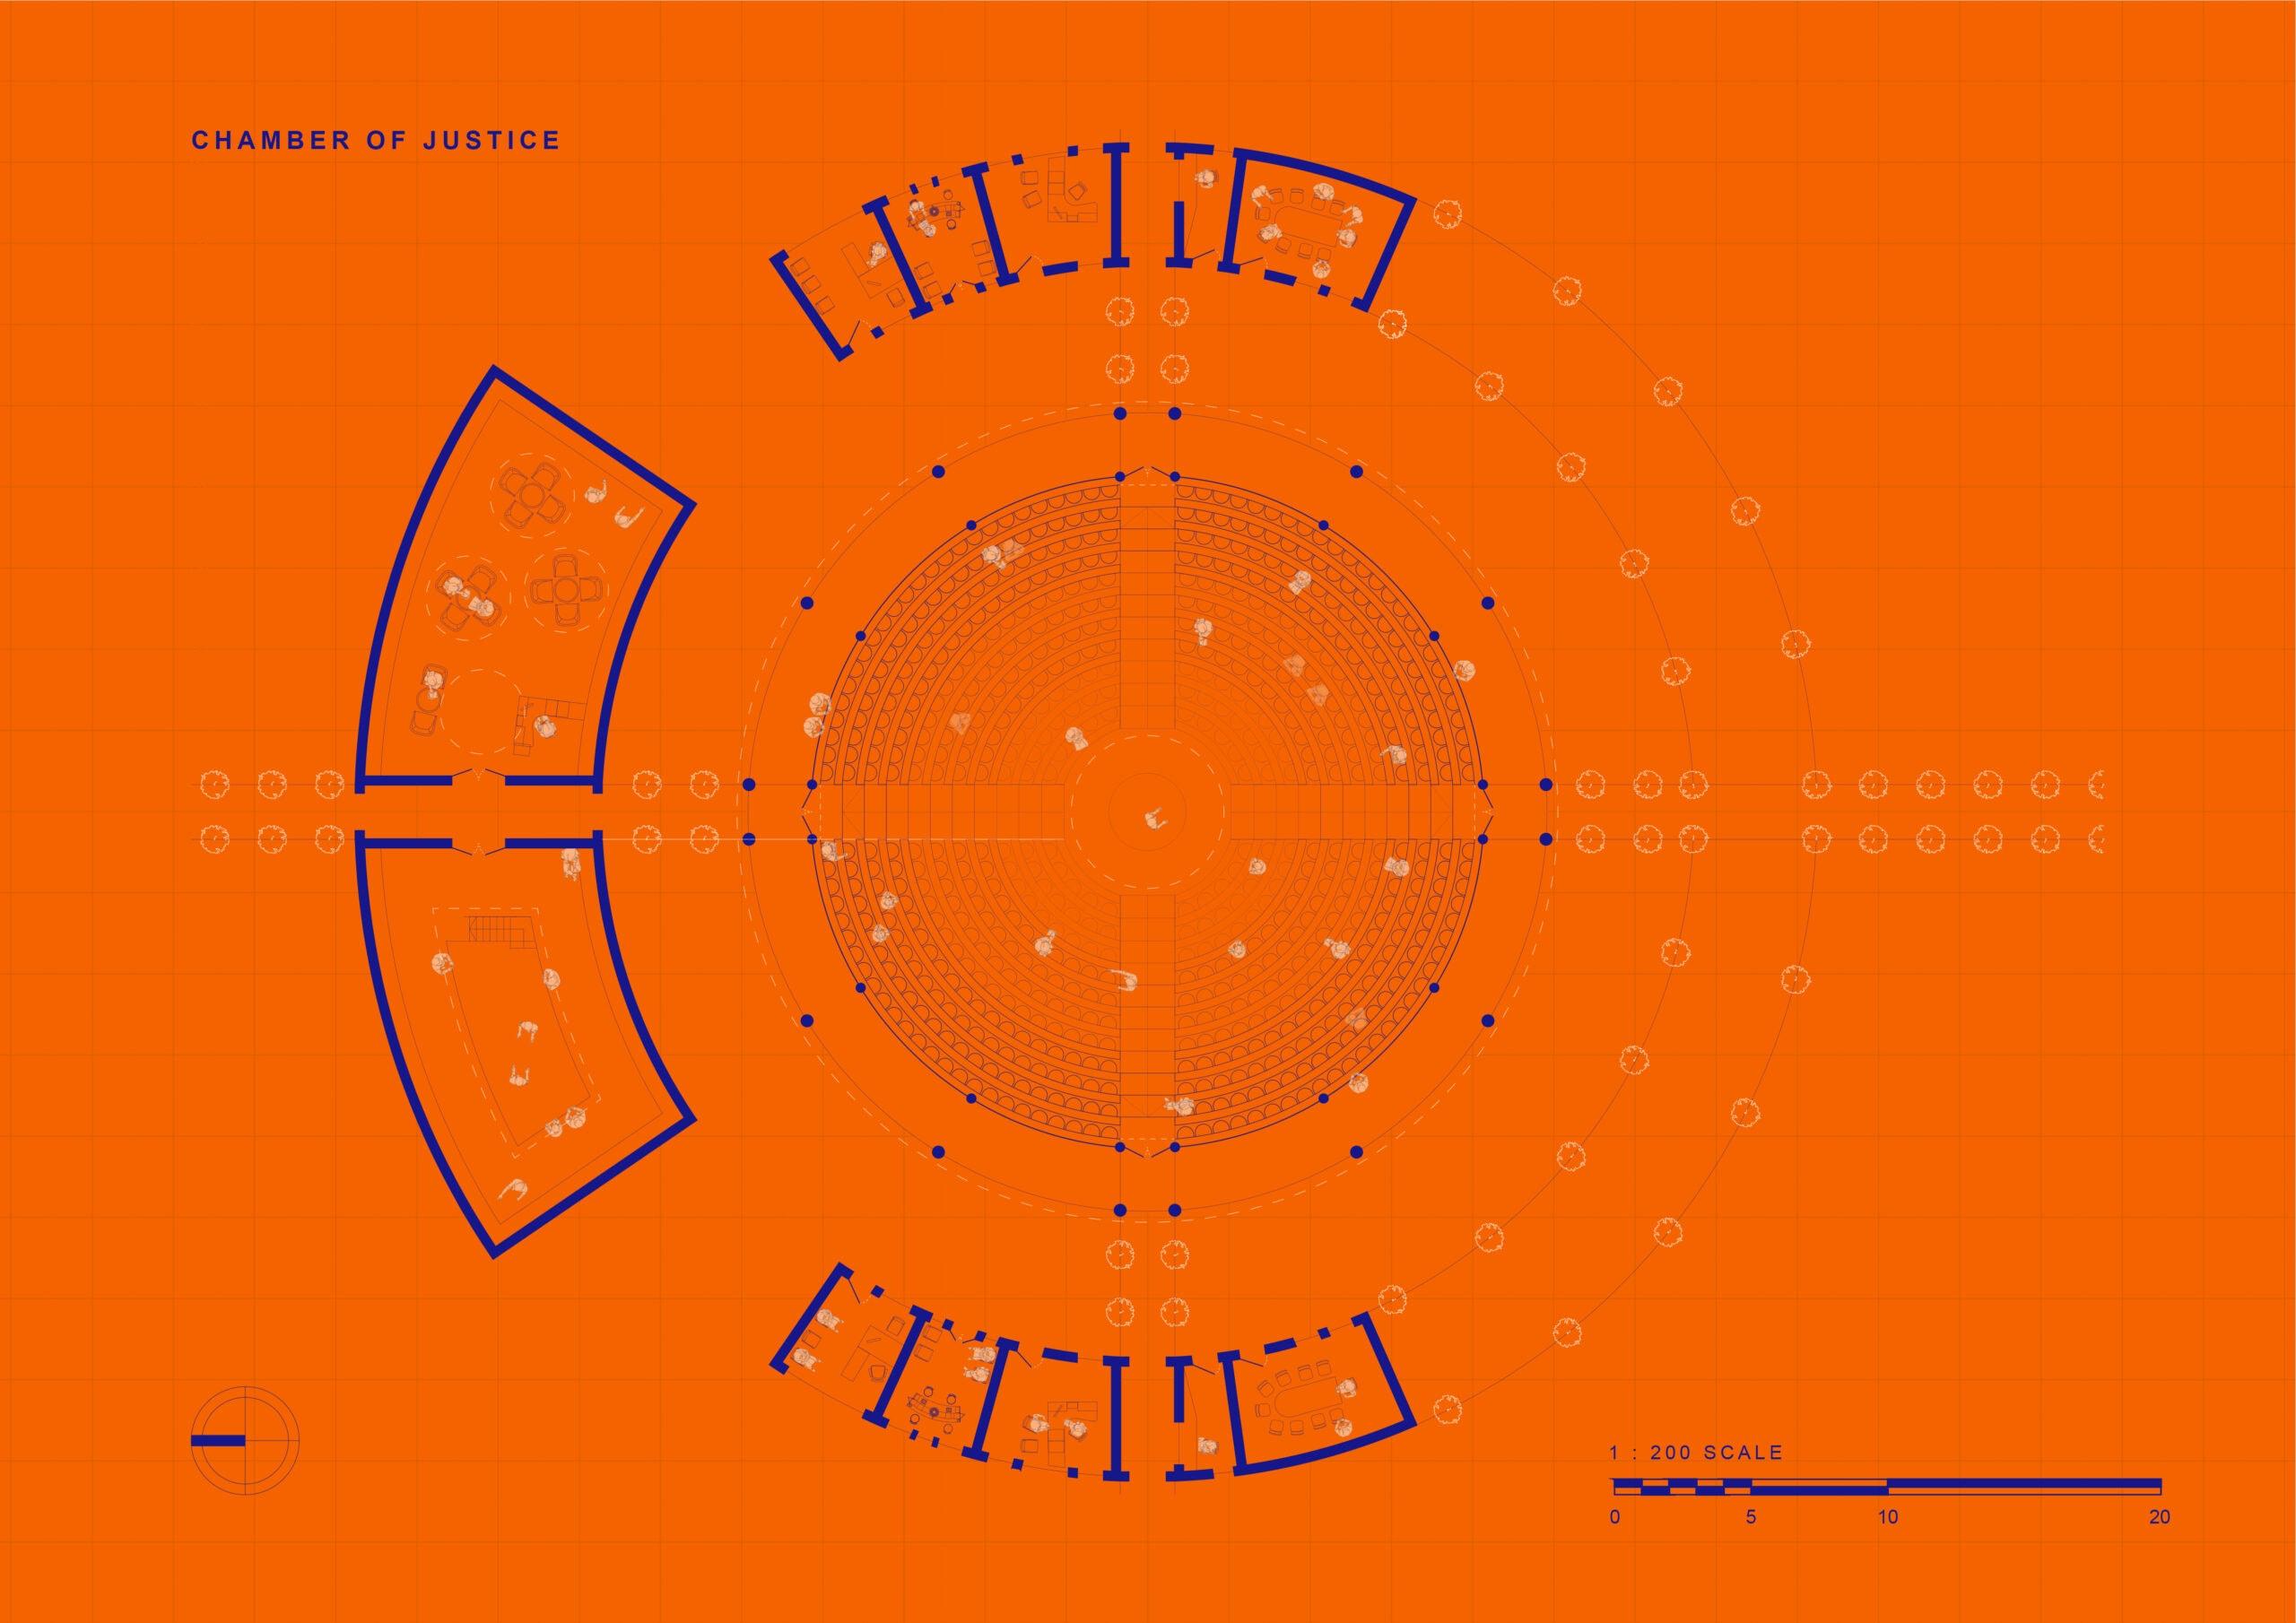 20996_chamber-of-justice_floorplan